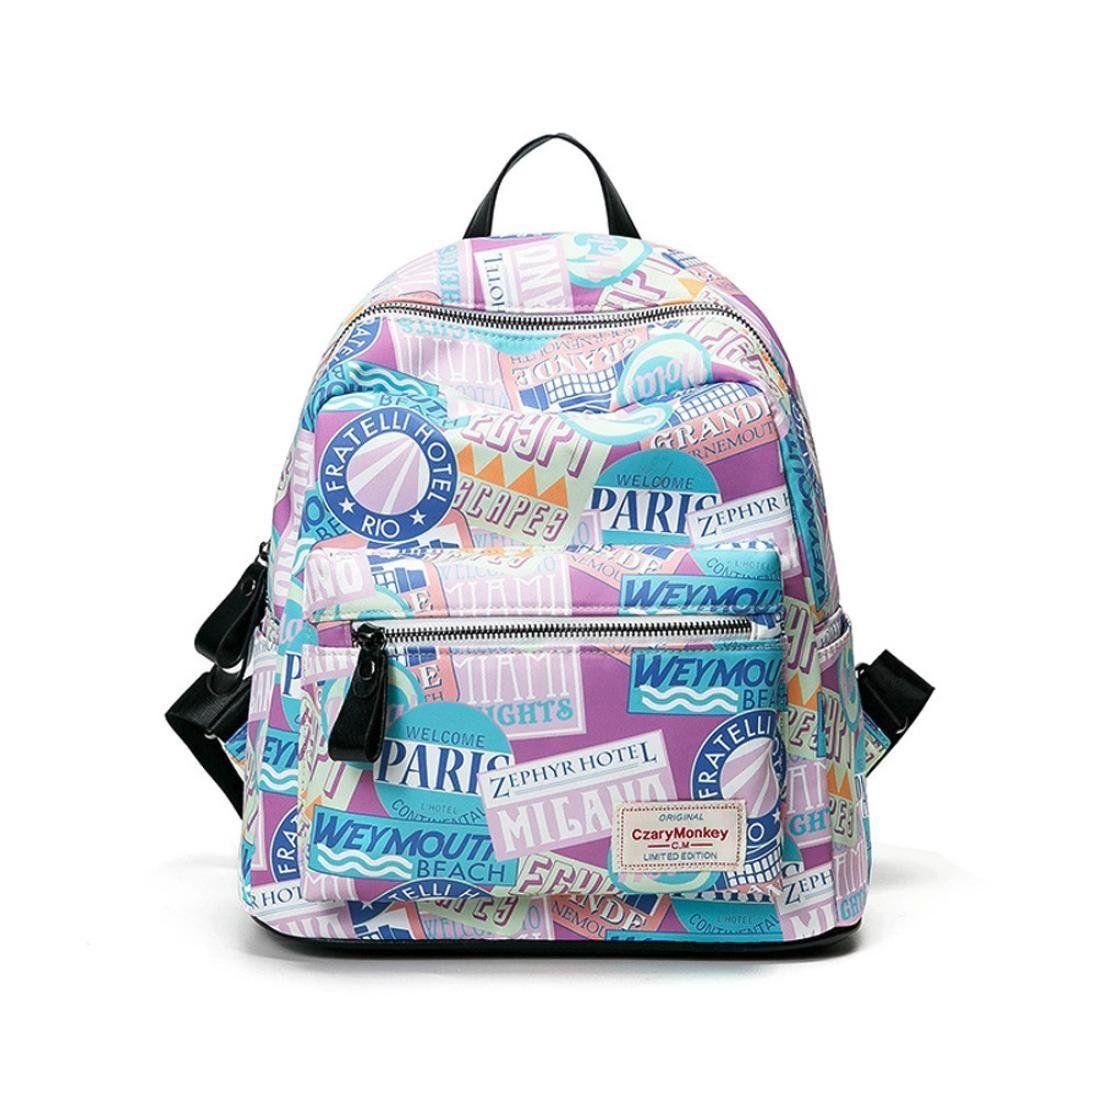 mochilas escolares juveniles niña Switchali Lona bolsas escolares moda  floral Pijo Mochila escolares niño mochilas mujer ea8d12a90810b